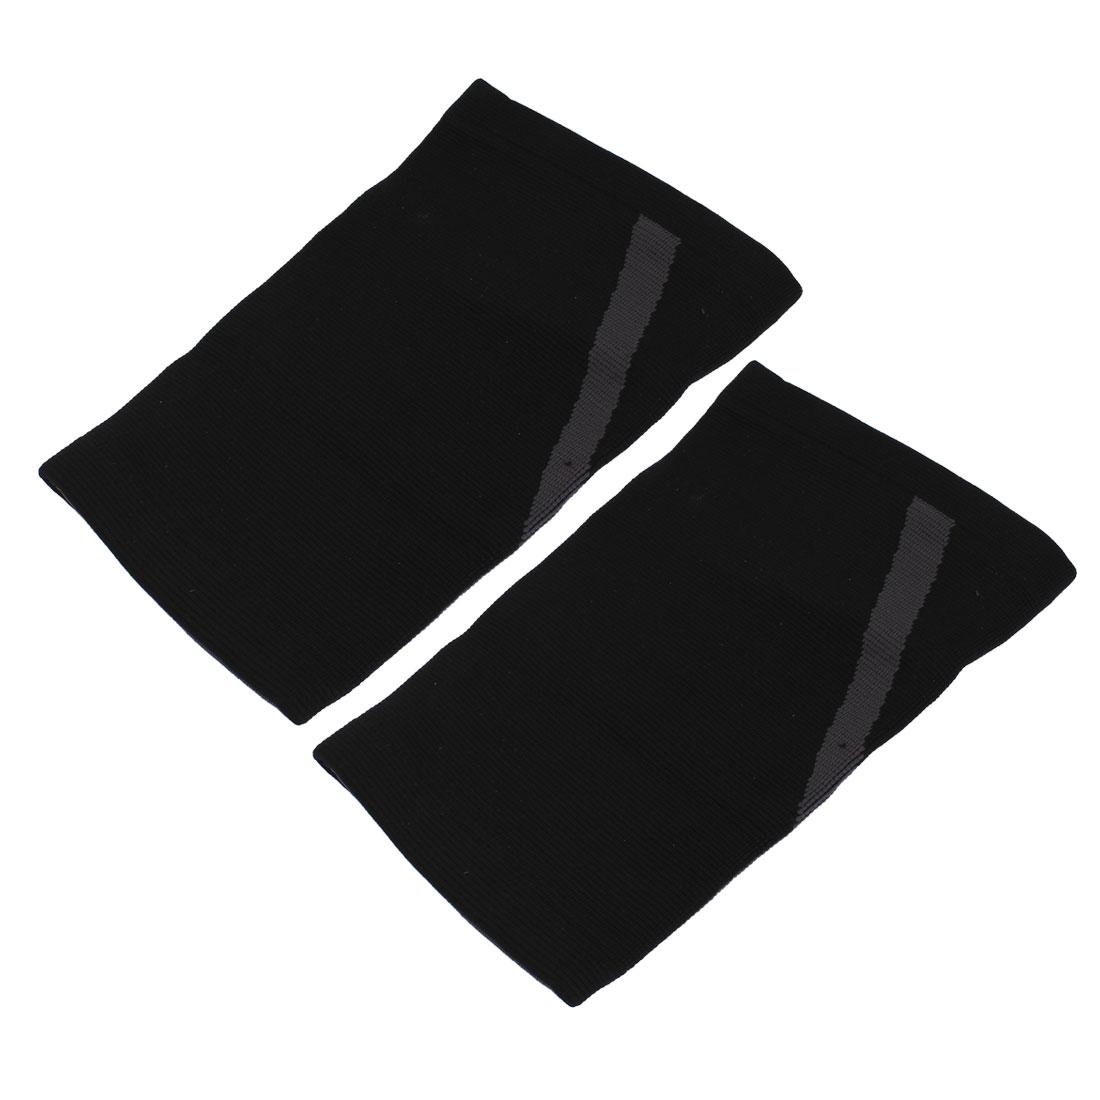 2pcs Black Elastic Knee Support Patella Sports Protective Brace Pad Kneepad